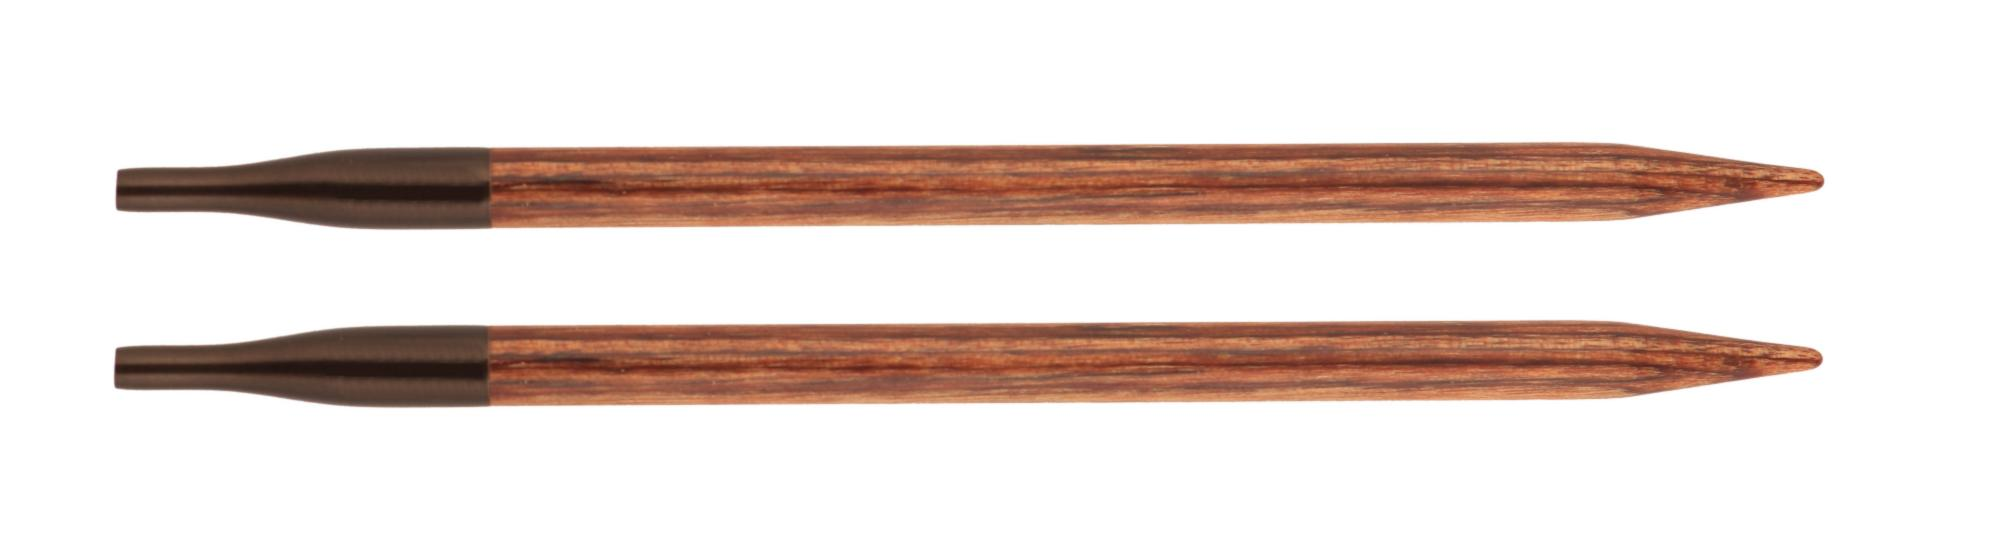 31204 Спицы съемные 3.75 мм Ginger KnitPro